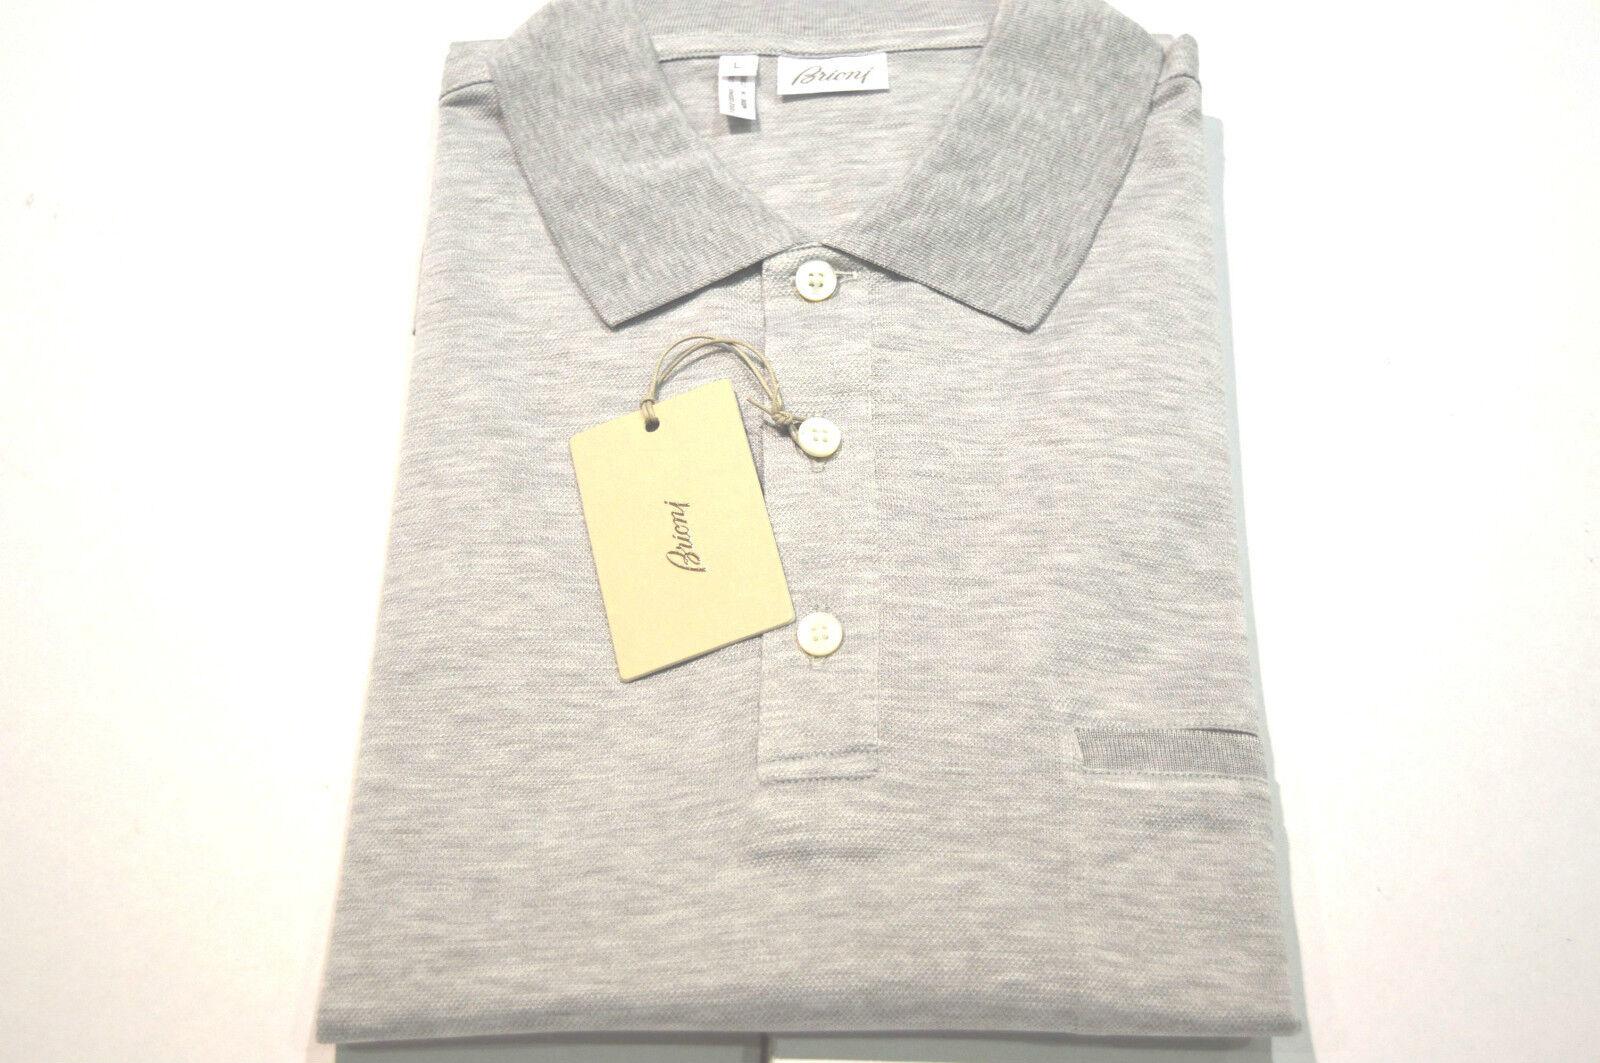 NEW  BRIONI Polo  Short Sleeve Cotton Größe XL Us Eu 54 (Pocket)